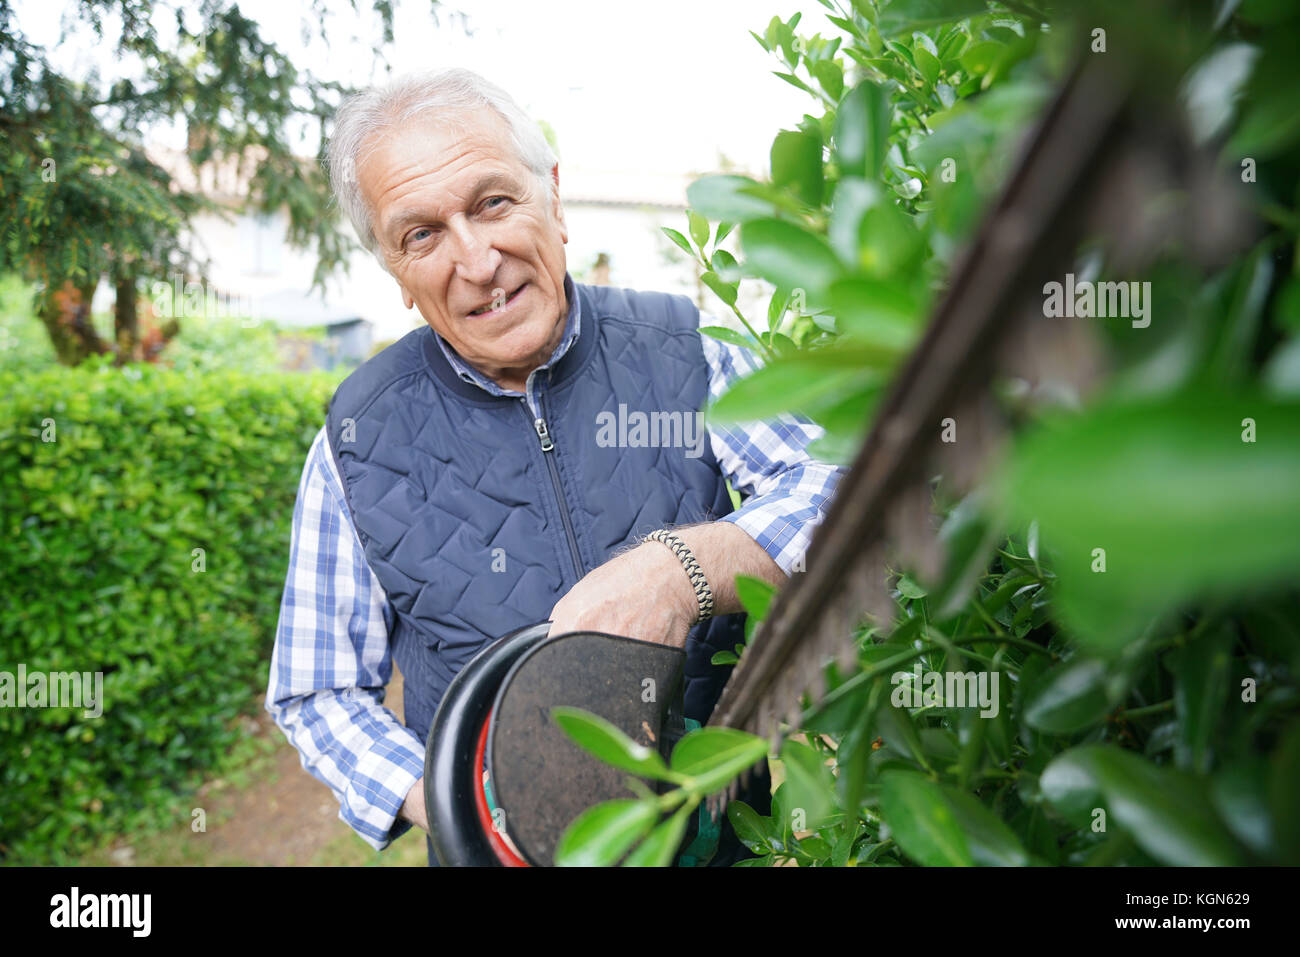 Senior man using hedge trimmer - Stock Image